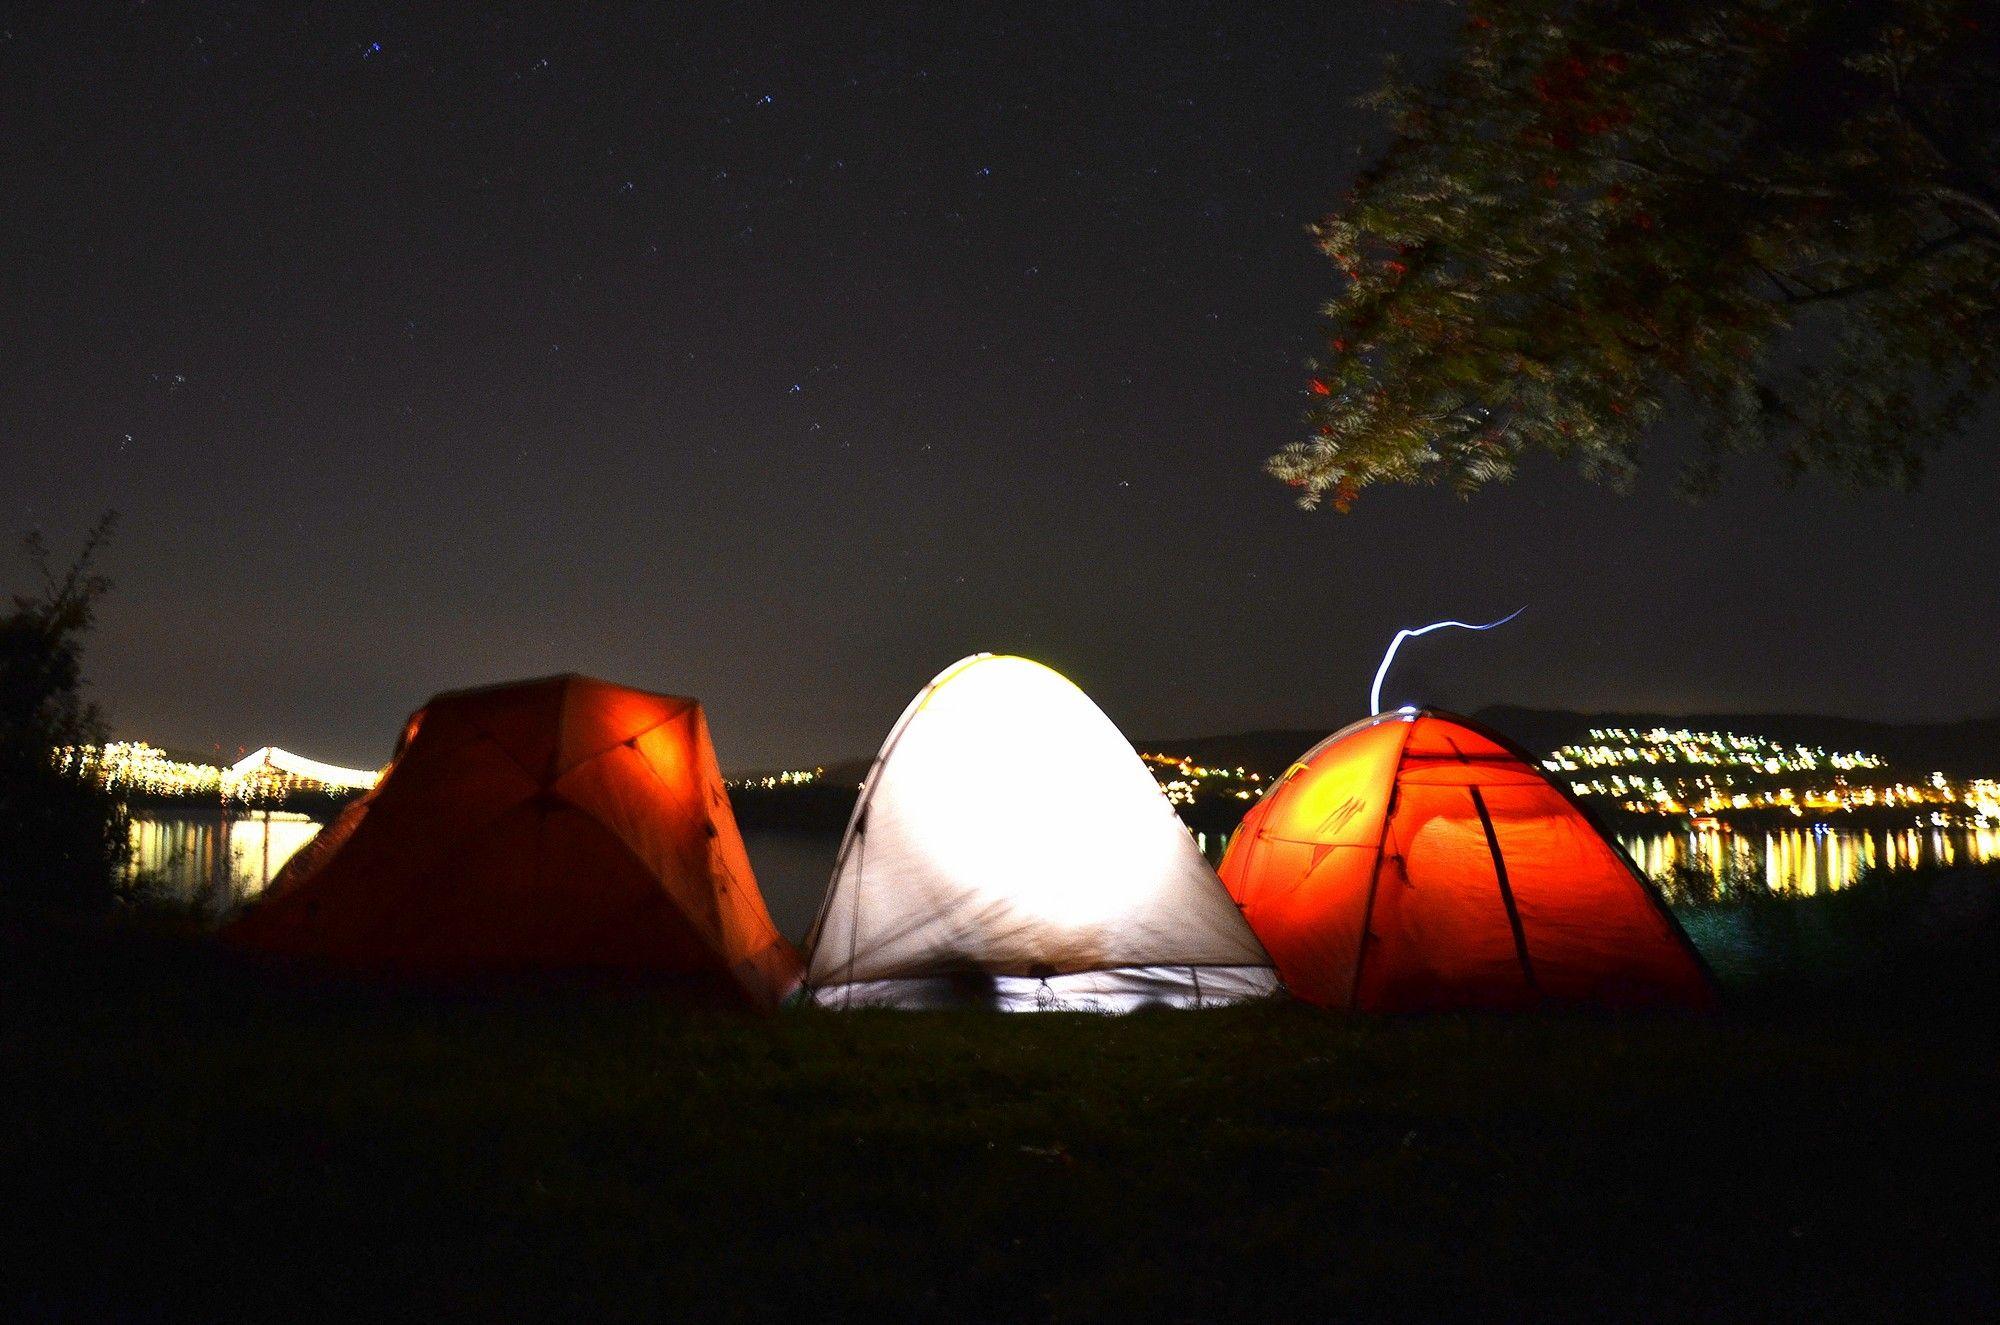 Campement près de Hellen